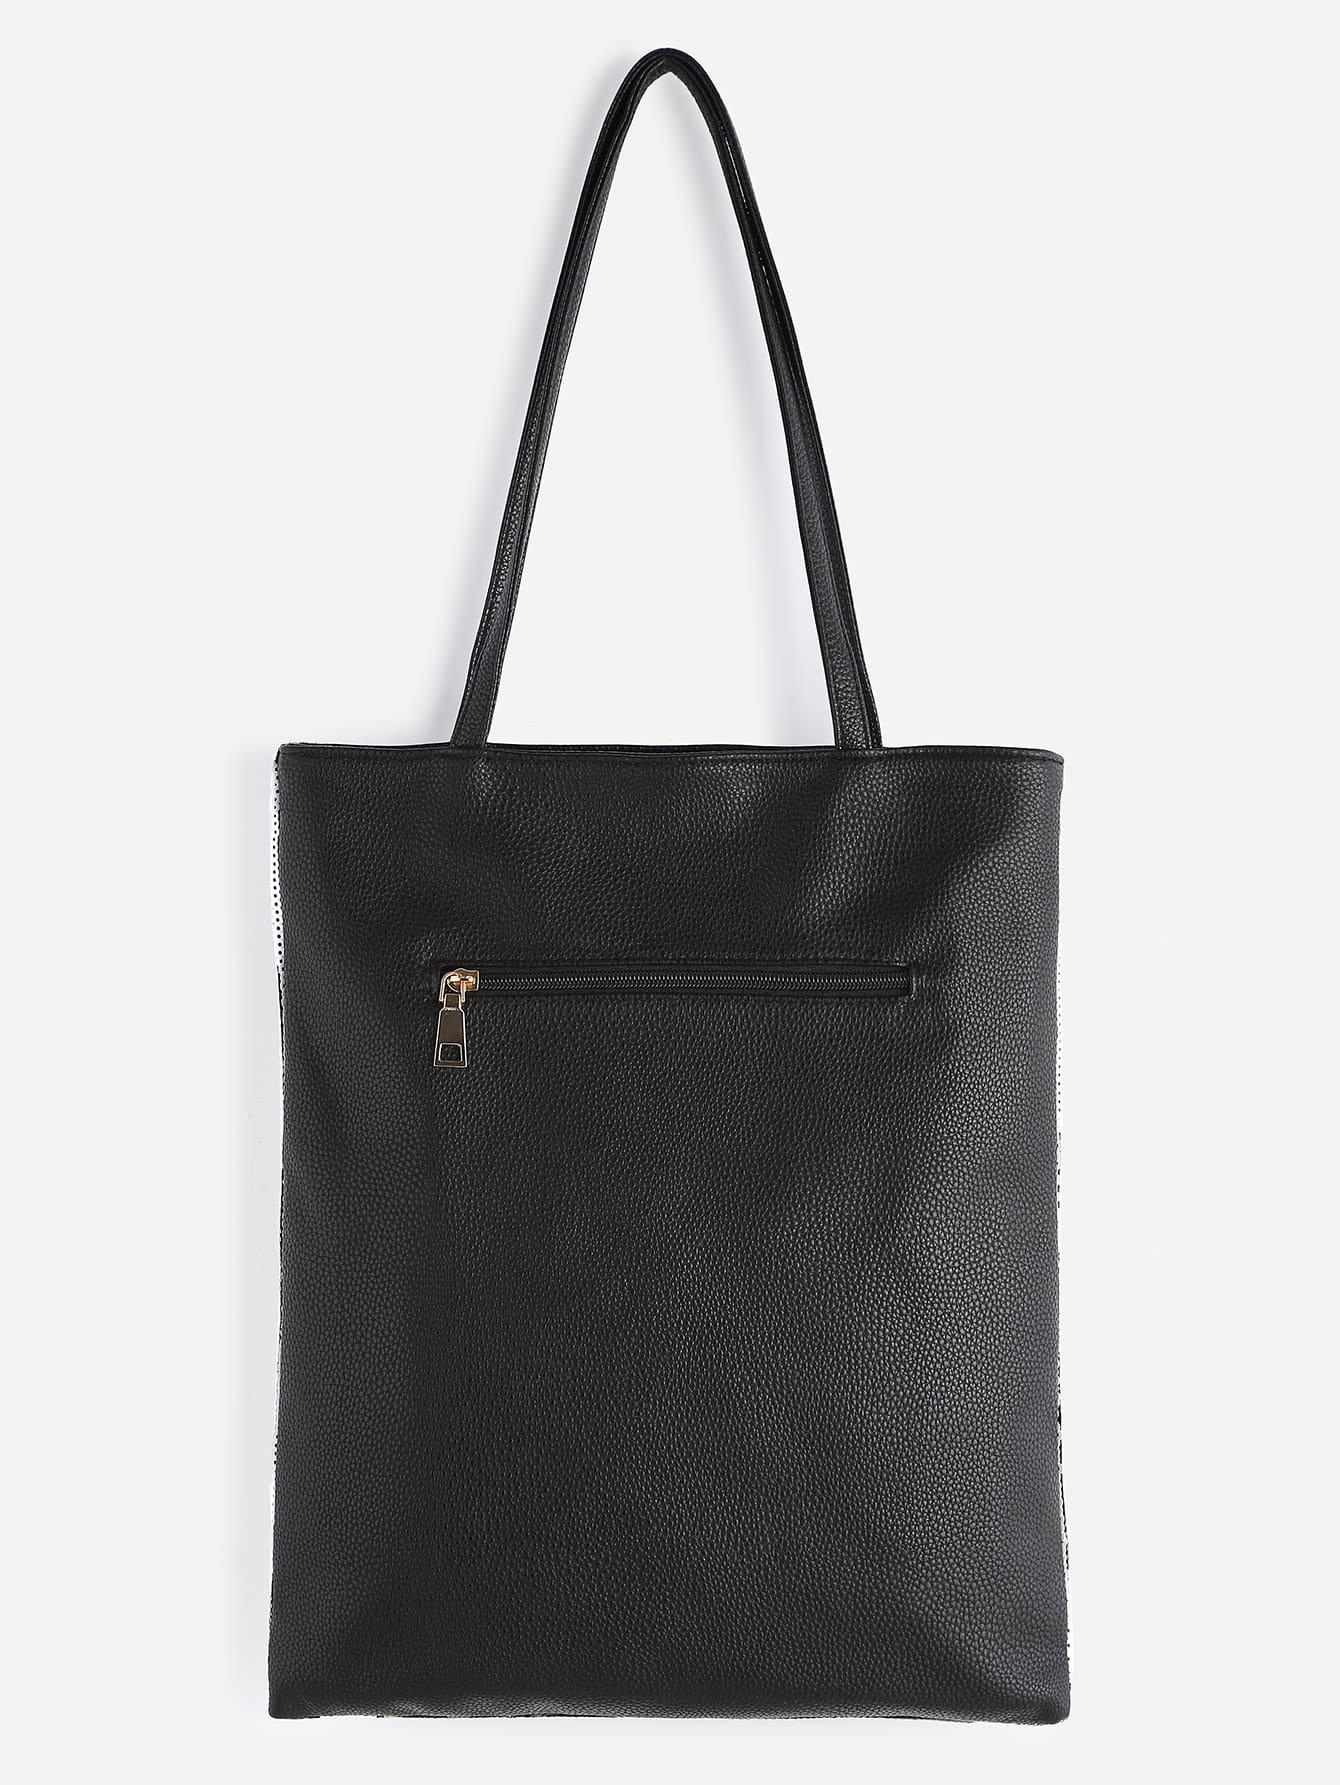 bag170222904_1